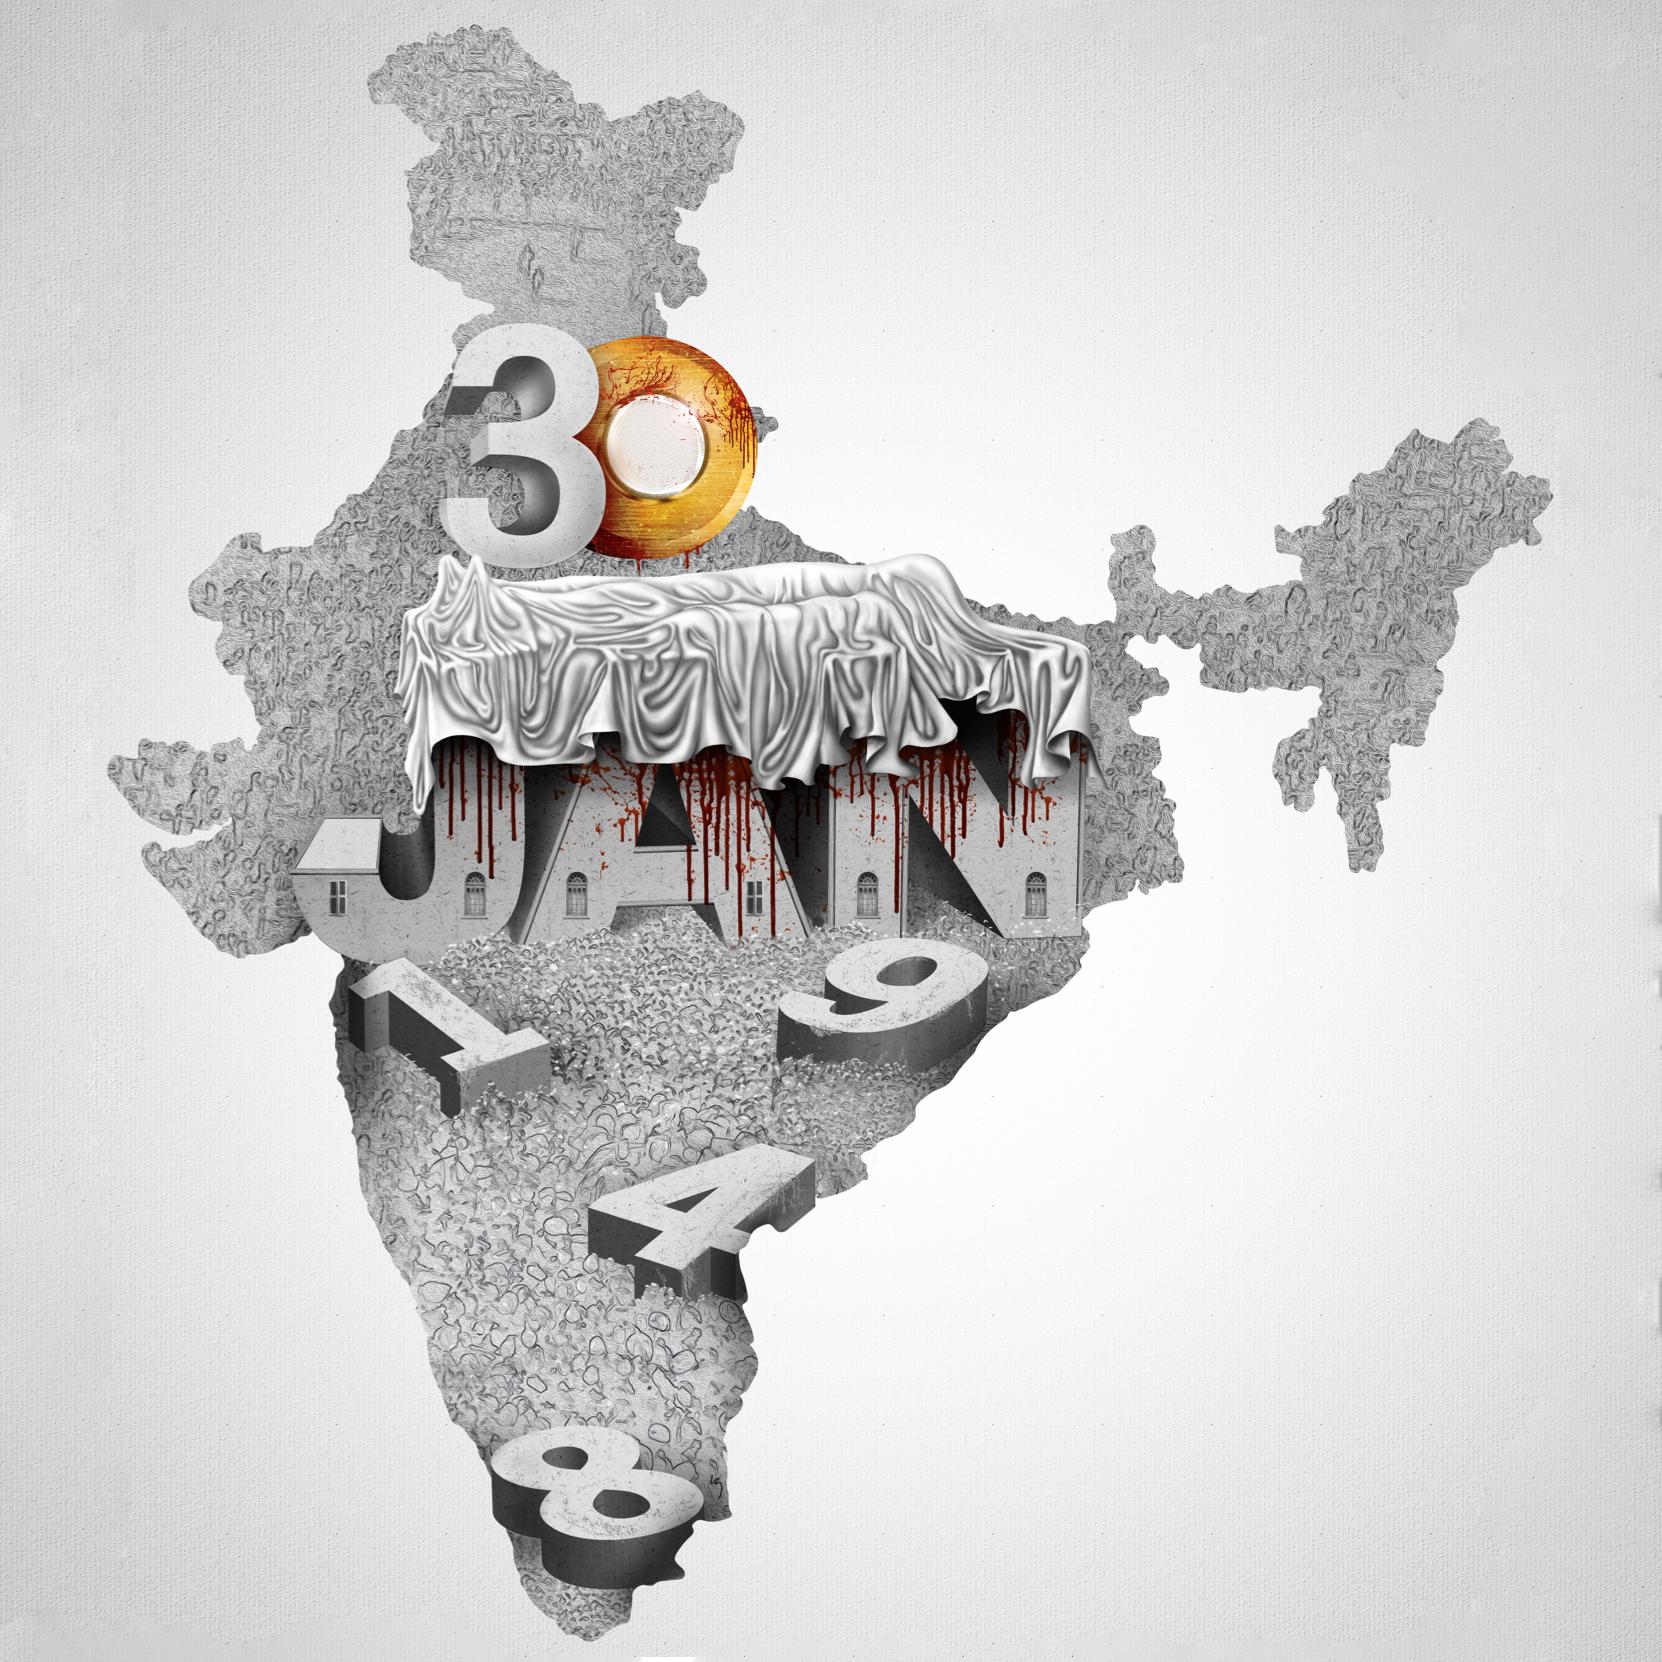 """The darkest day in Indian history. - Mahatma Gandhi assassinated by Nathuram Godse."" Mohammad Azad"